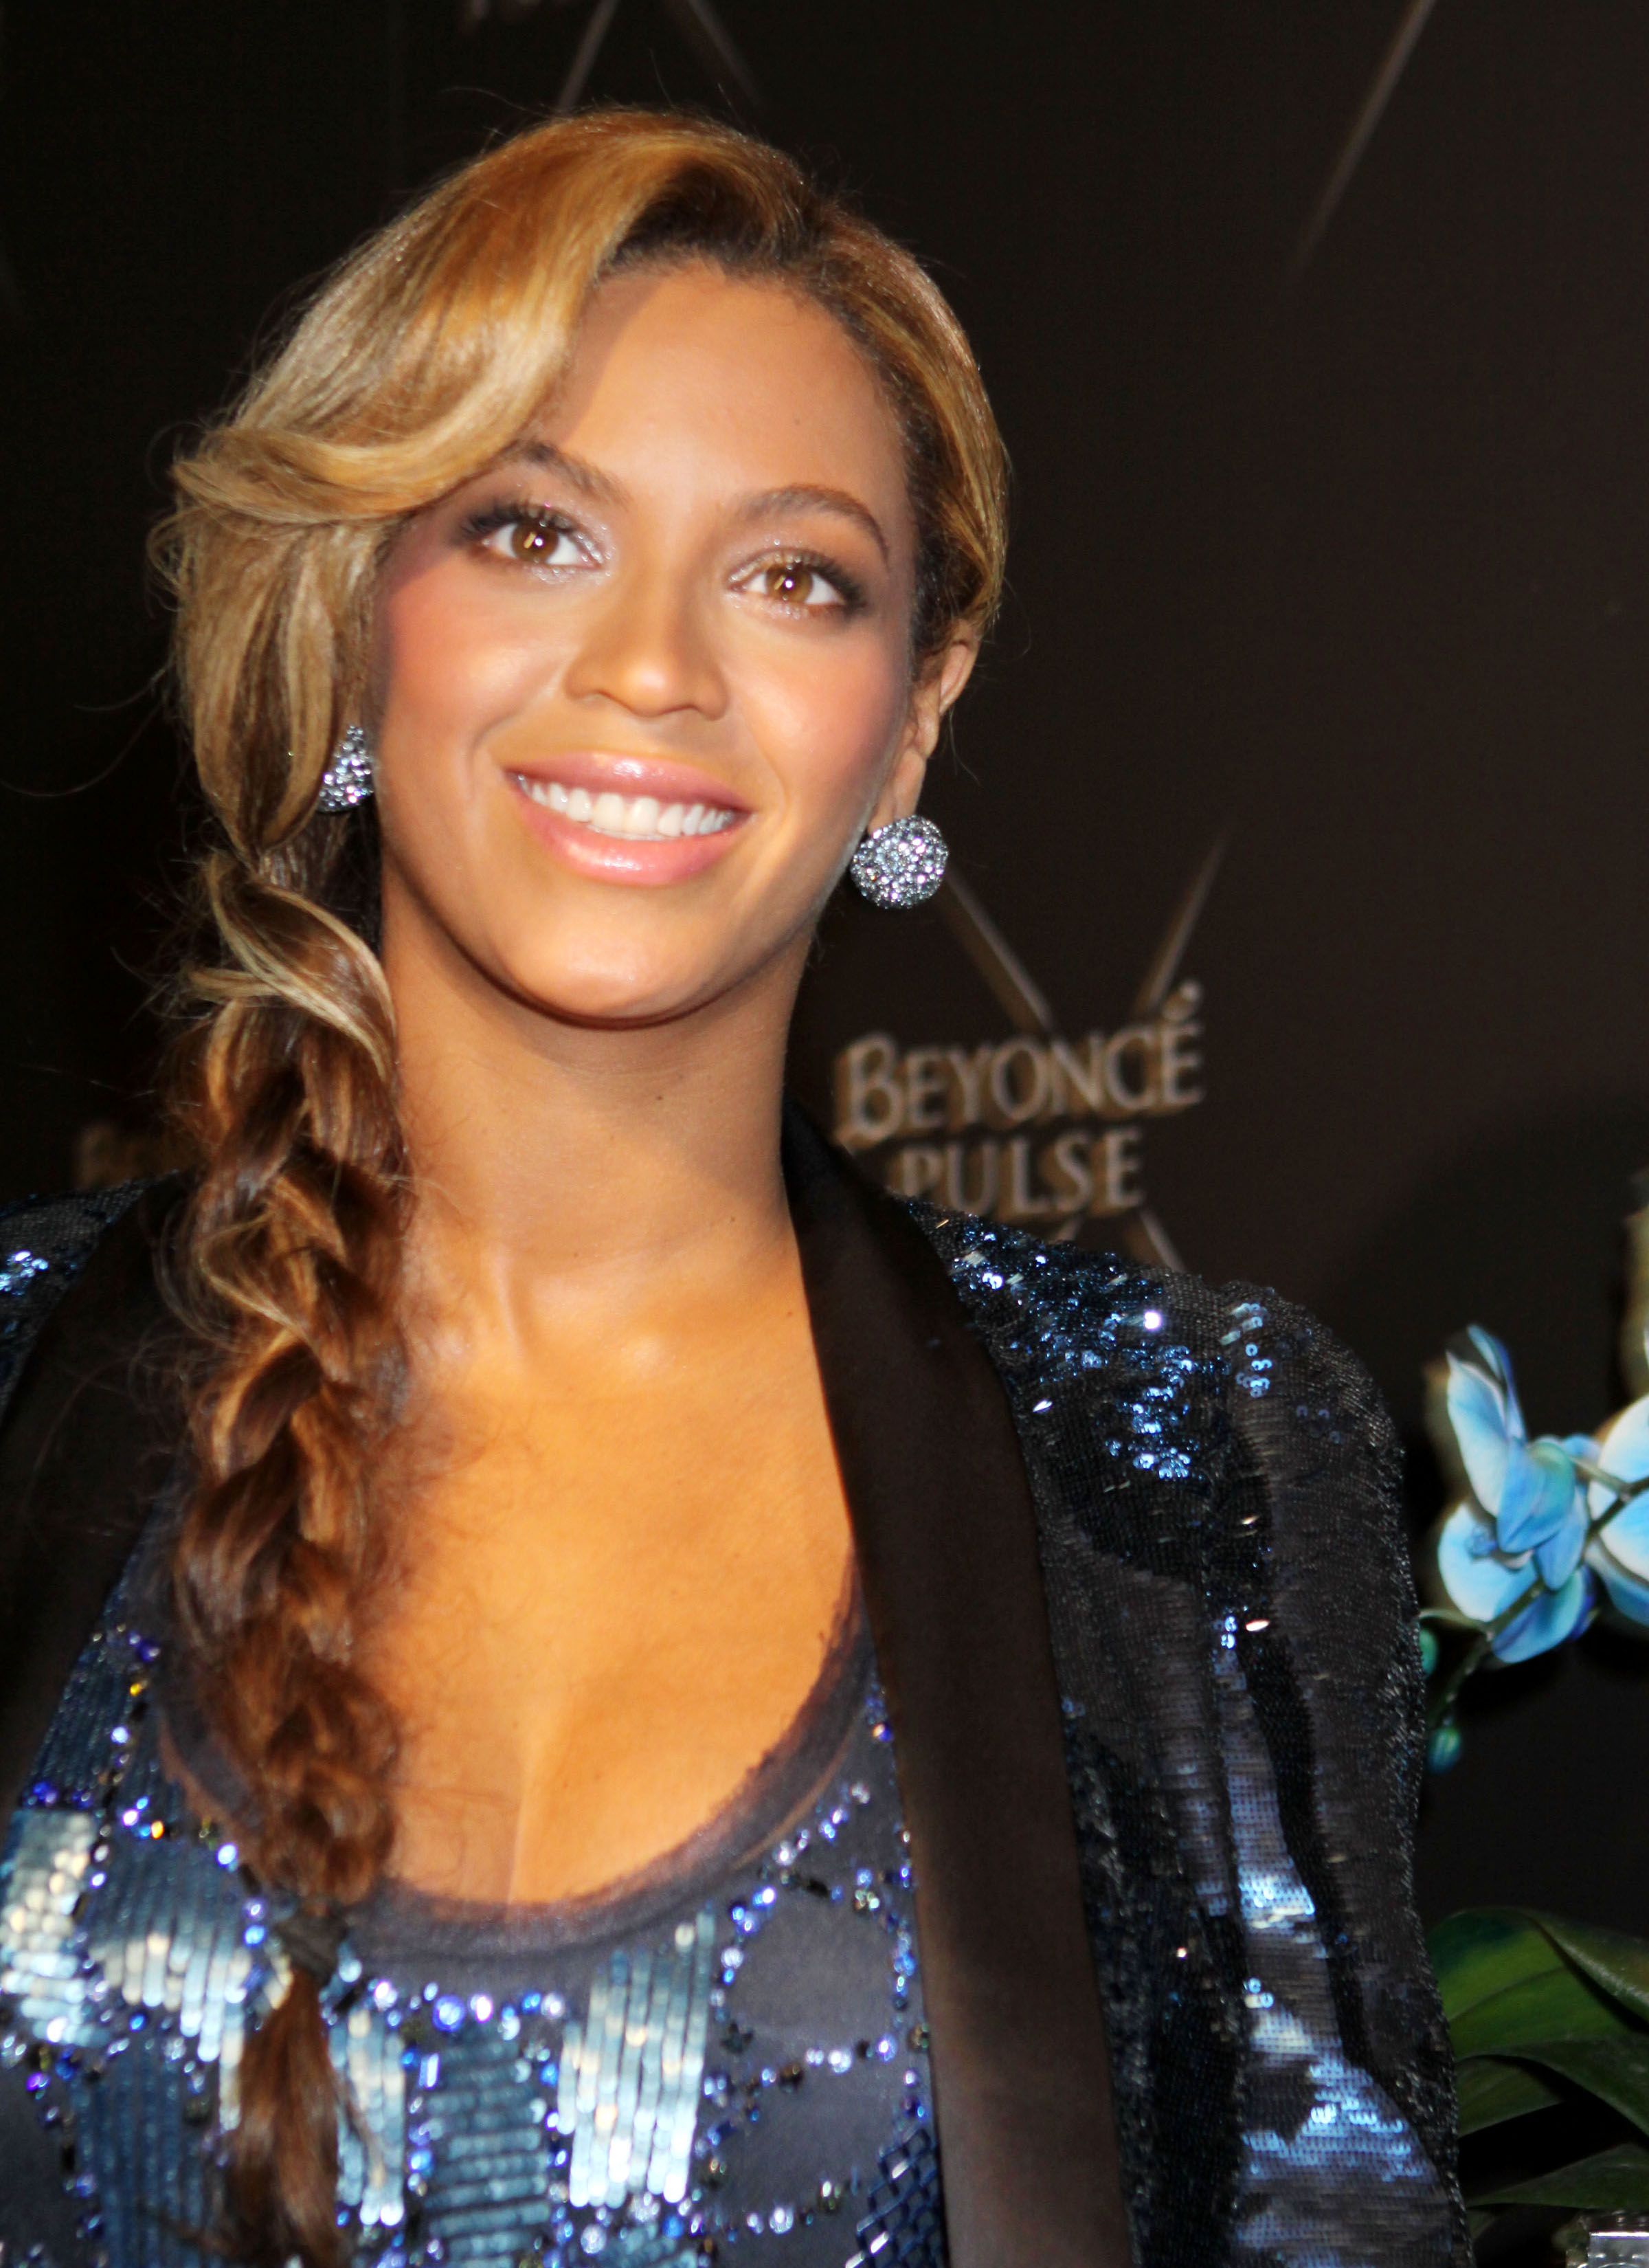 FP 7916601 Beyonce Pulse NYC 16 24